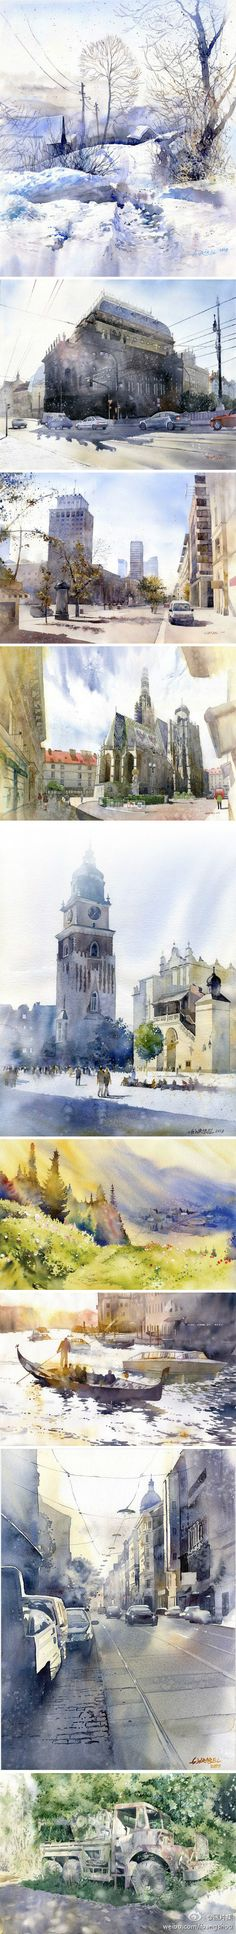 Grzegorz Wróbel #watercolor jd